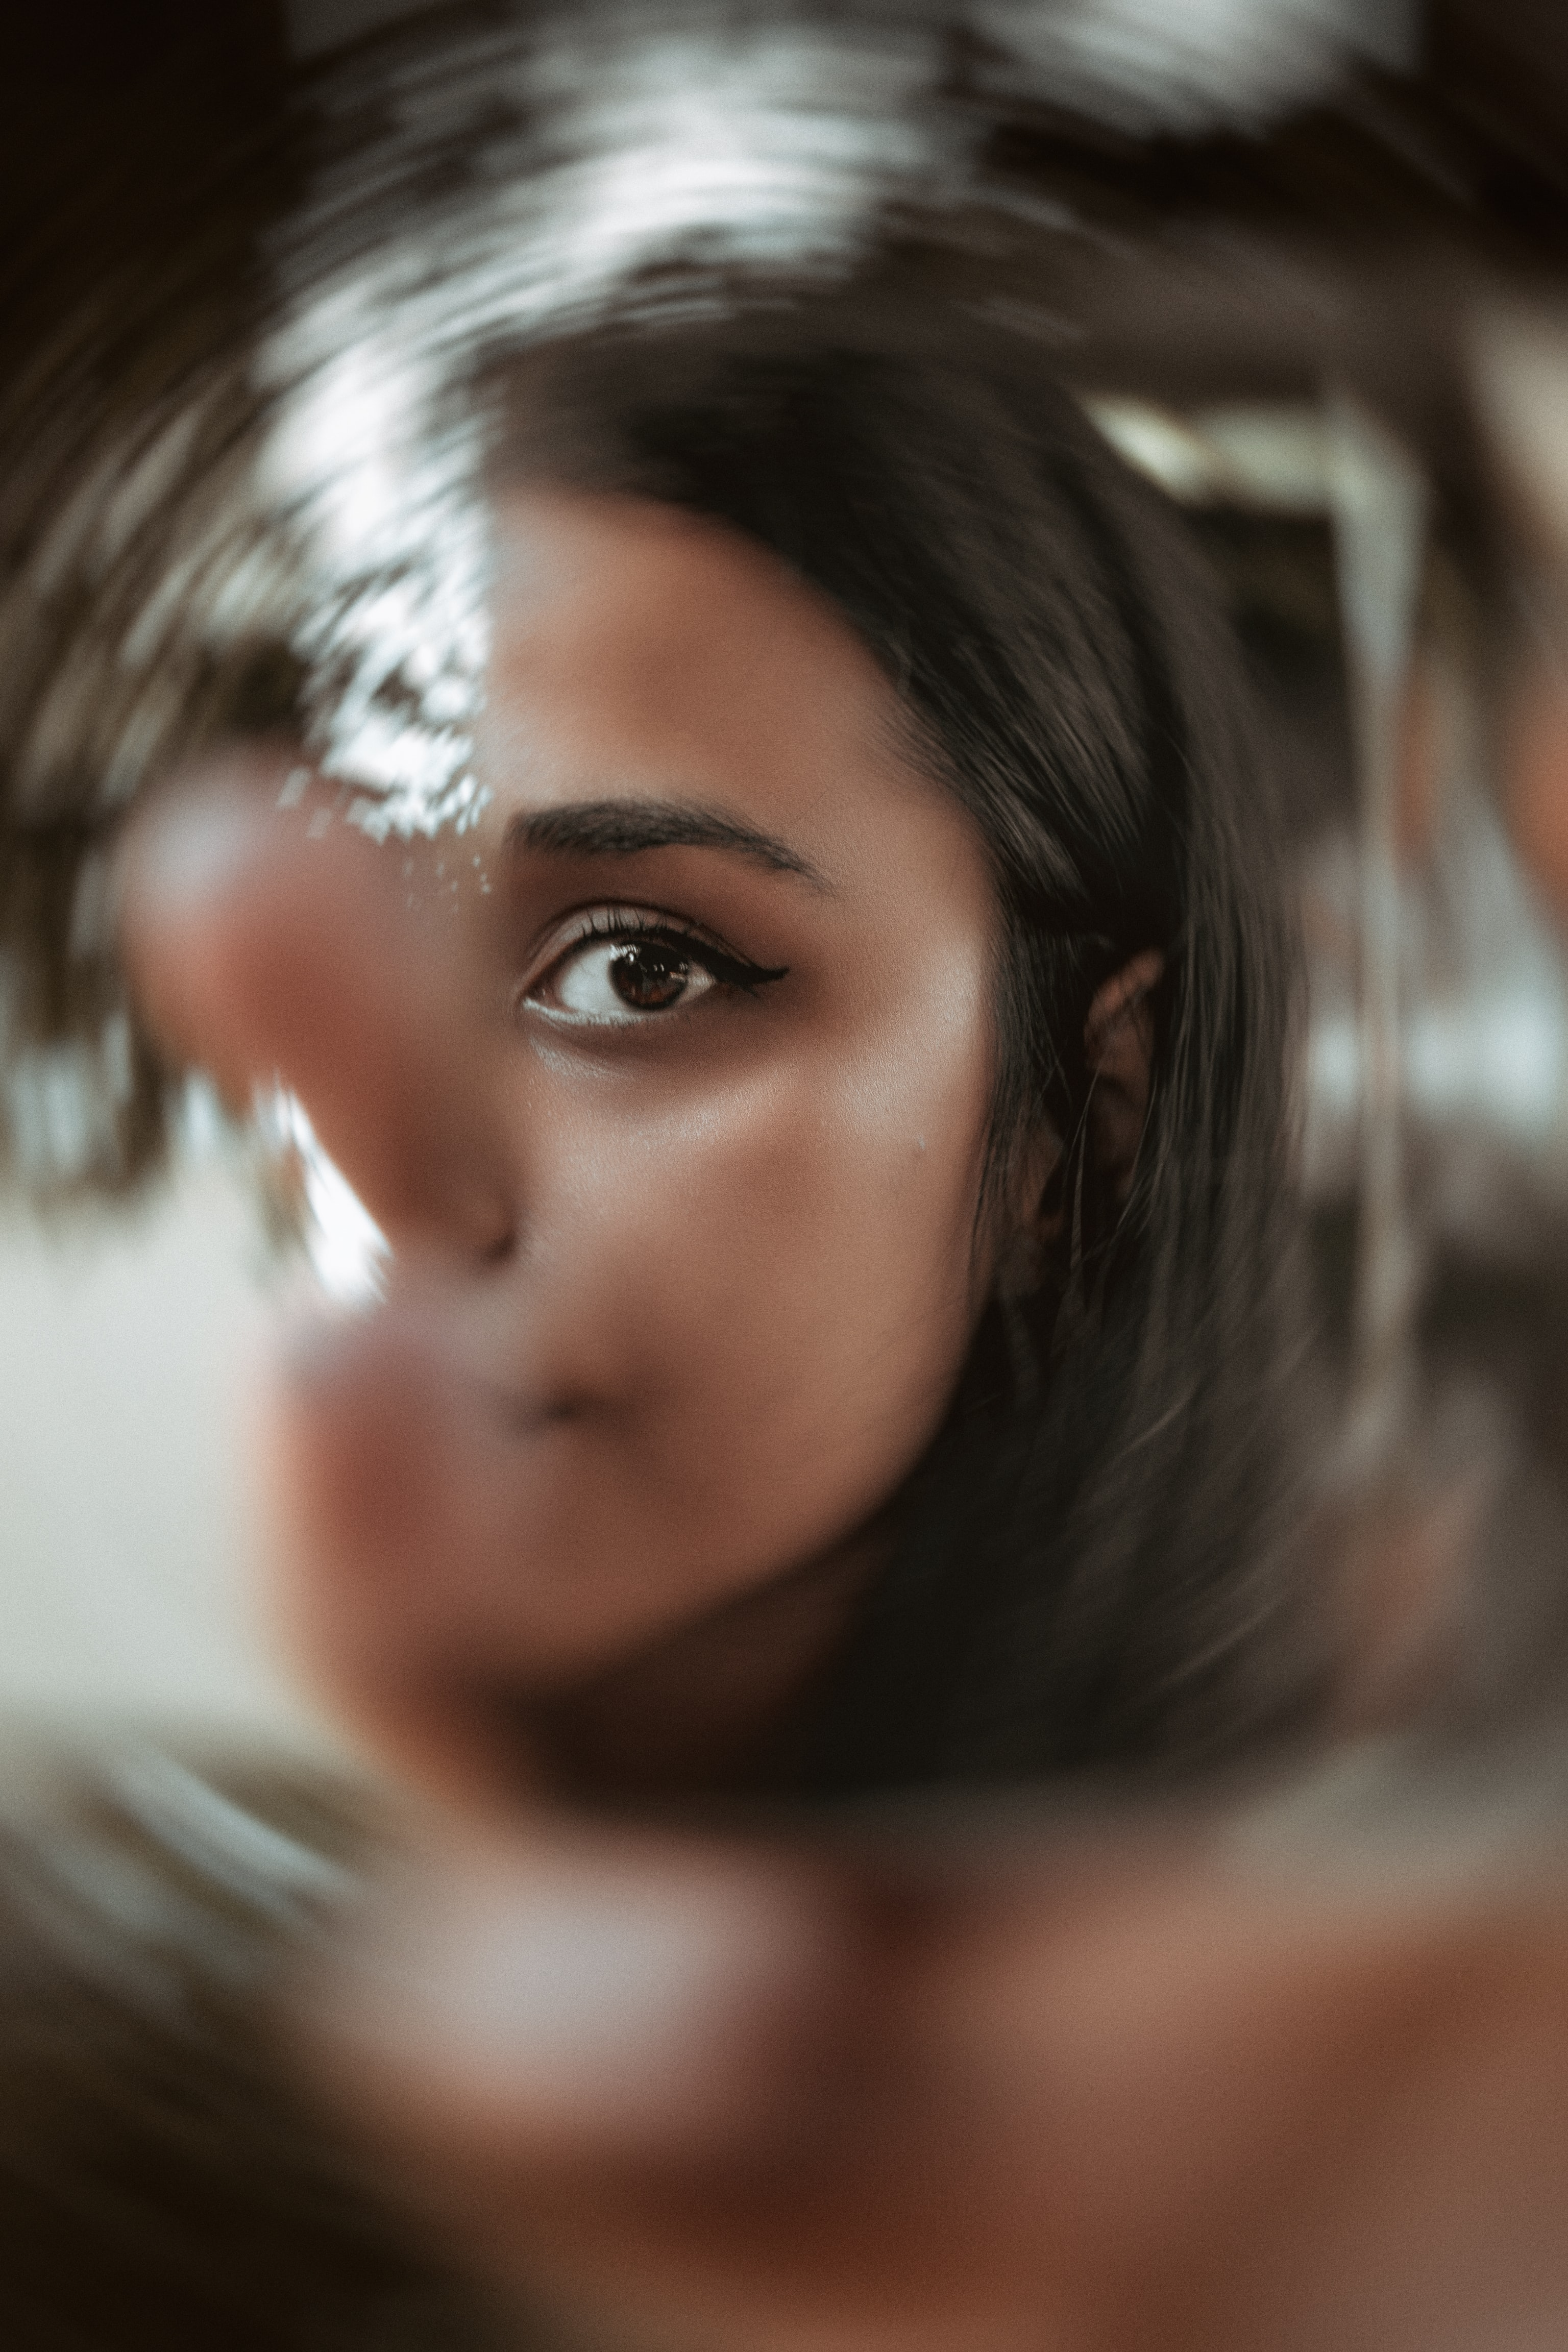 Girl looking through mirror